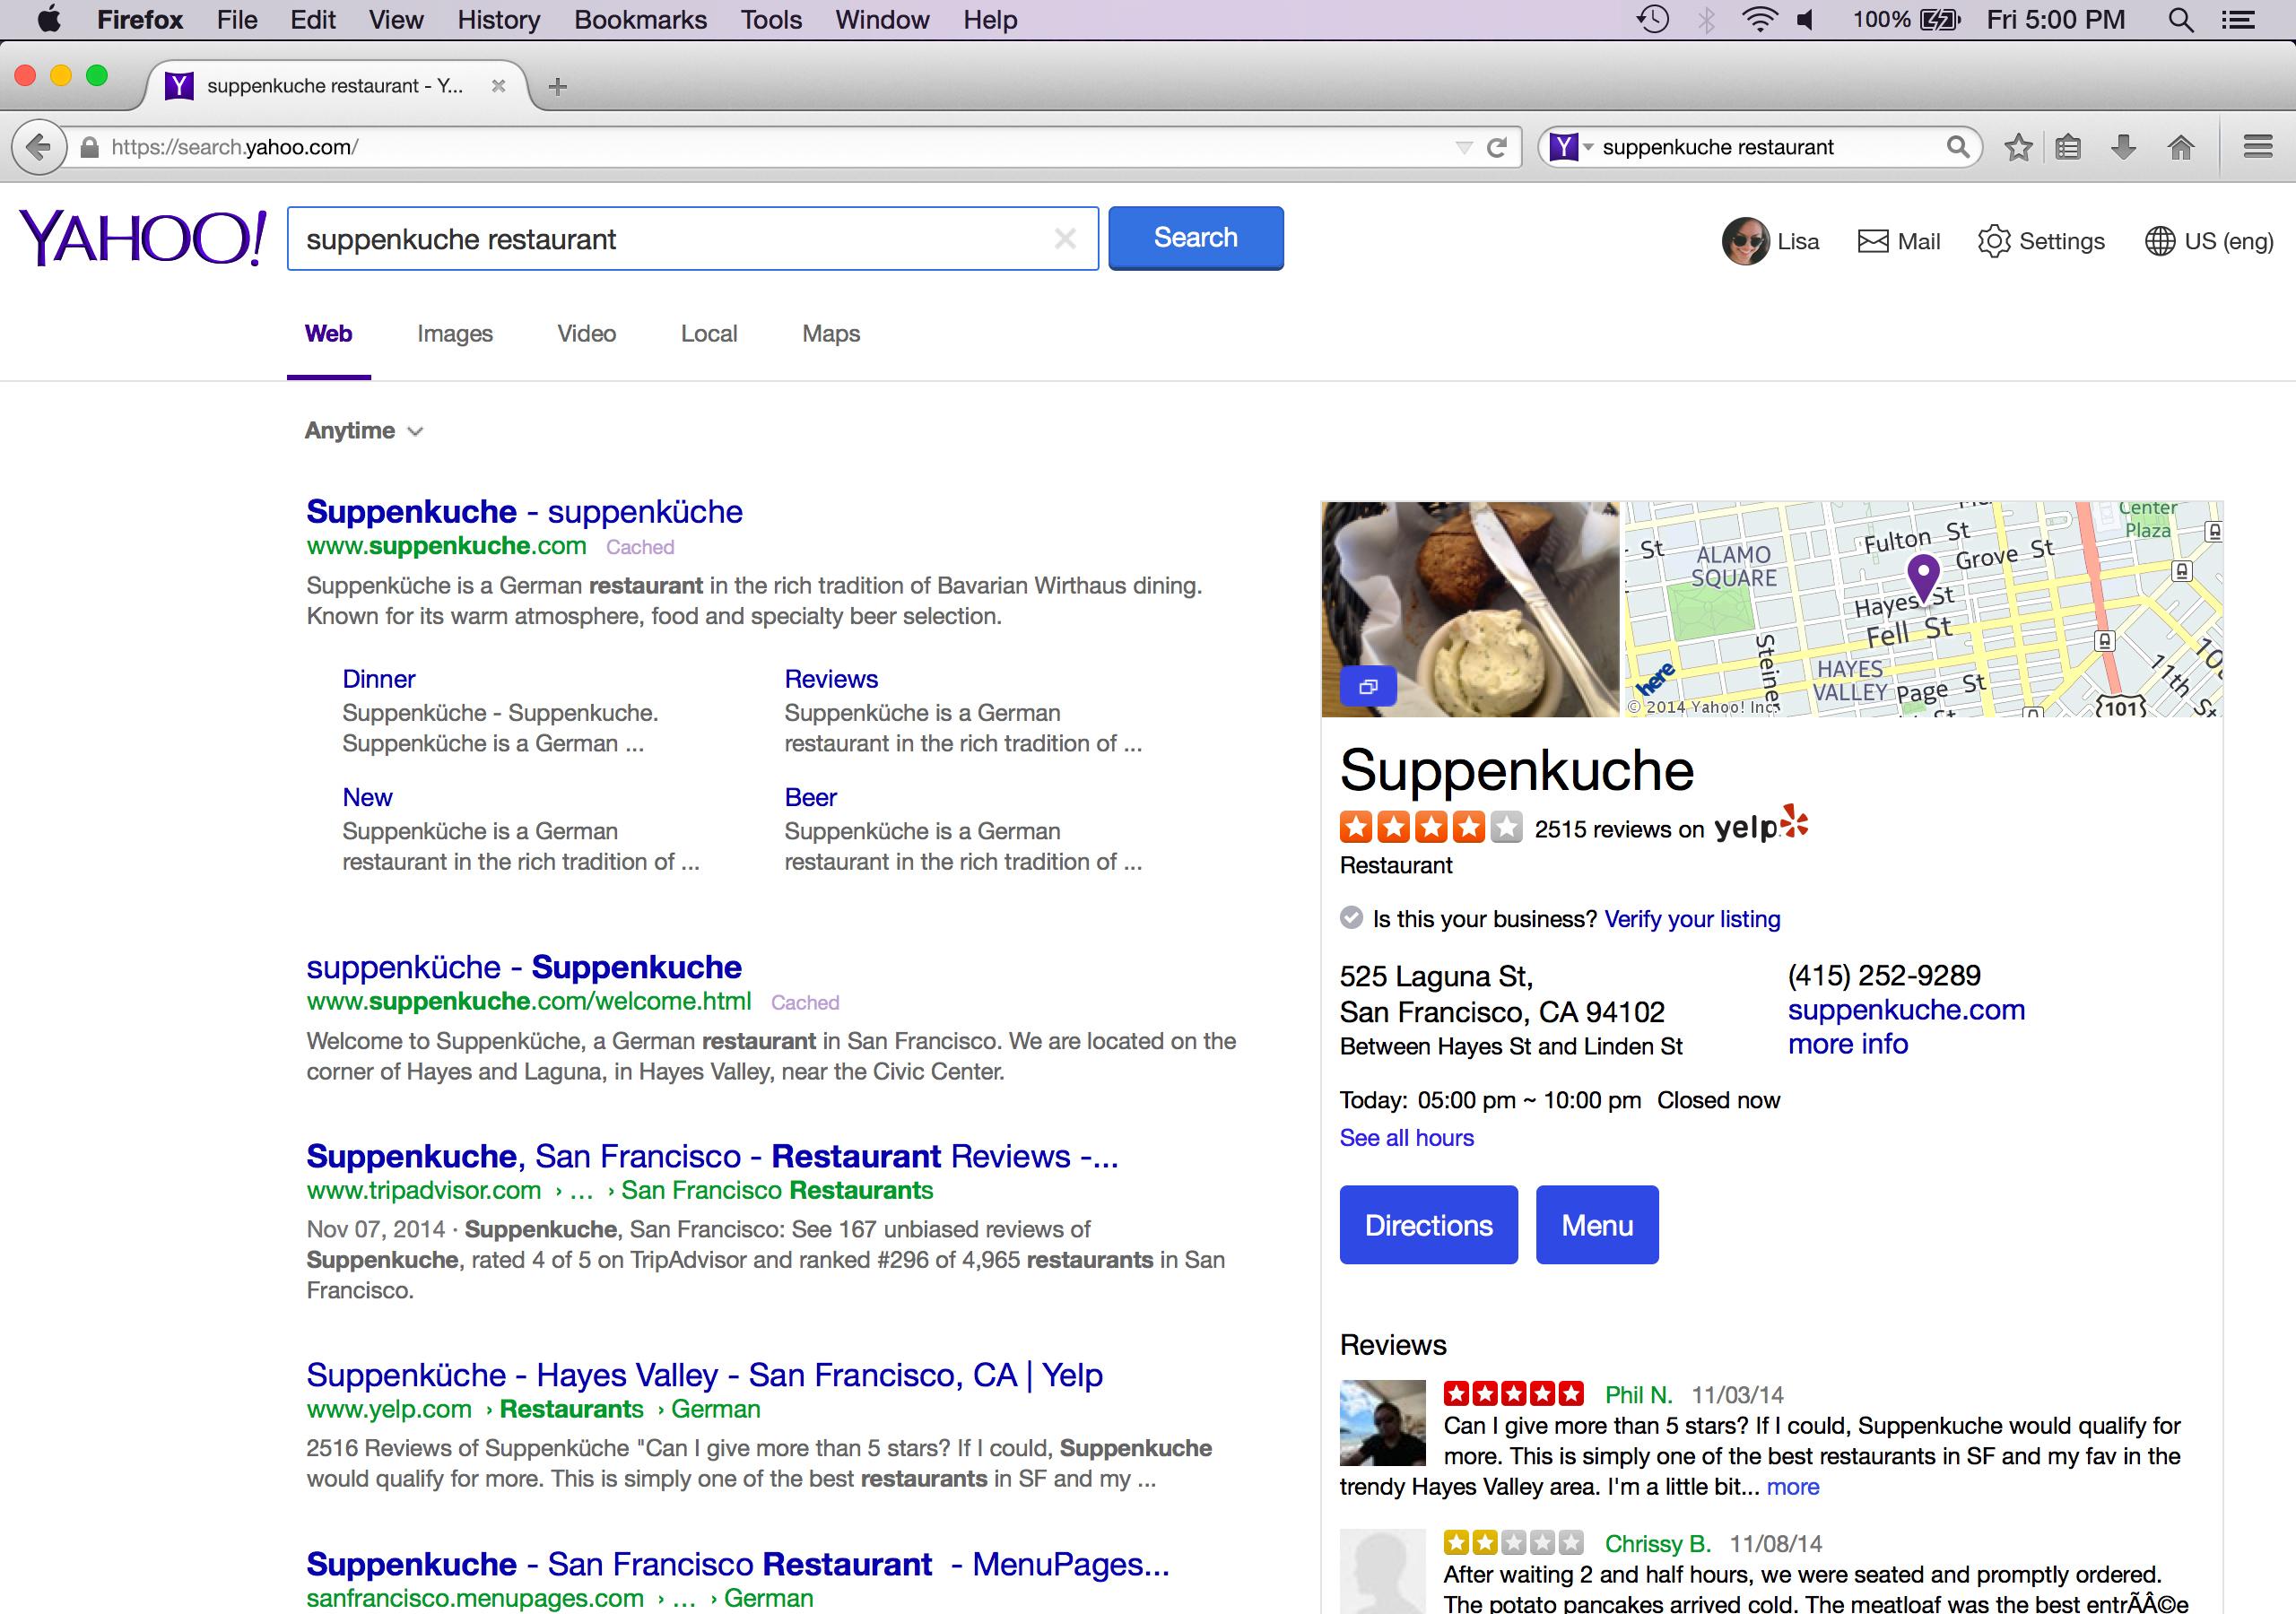 Yahoo and Mozilla Form Strategic Partnership   Business Wire